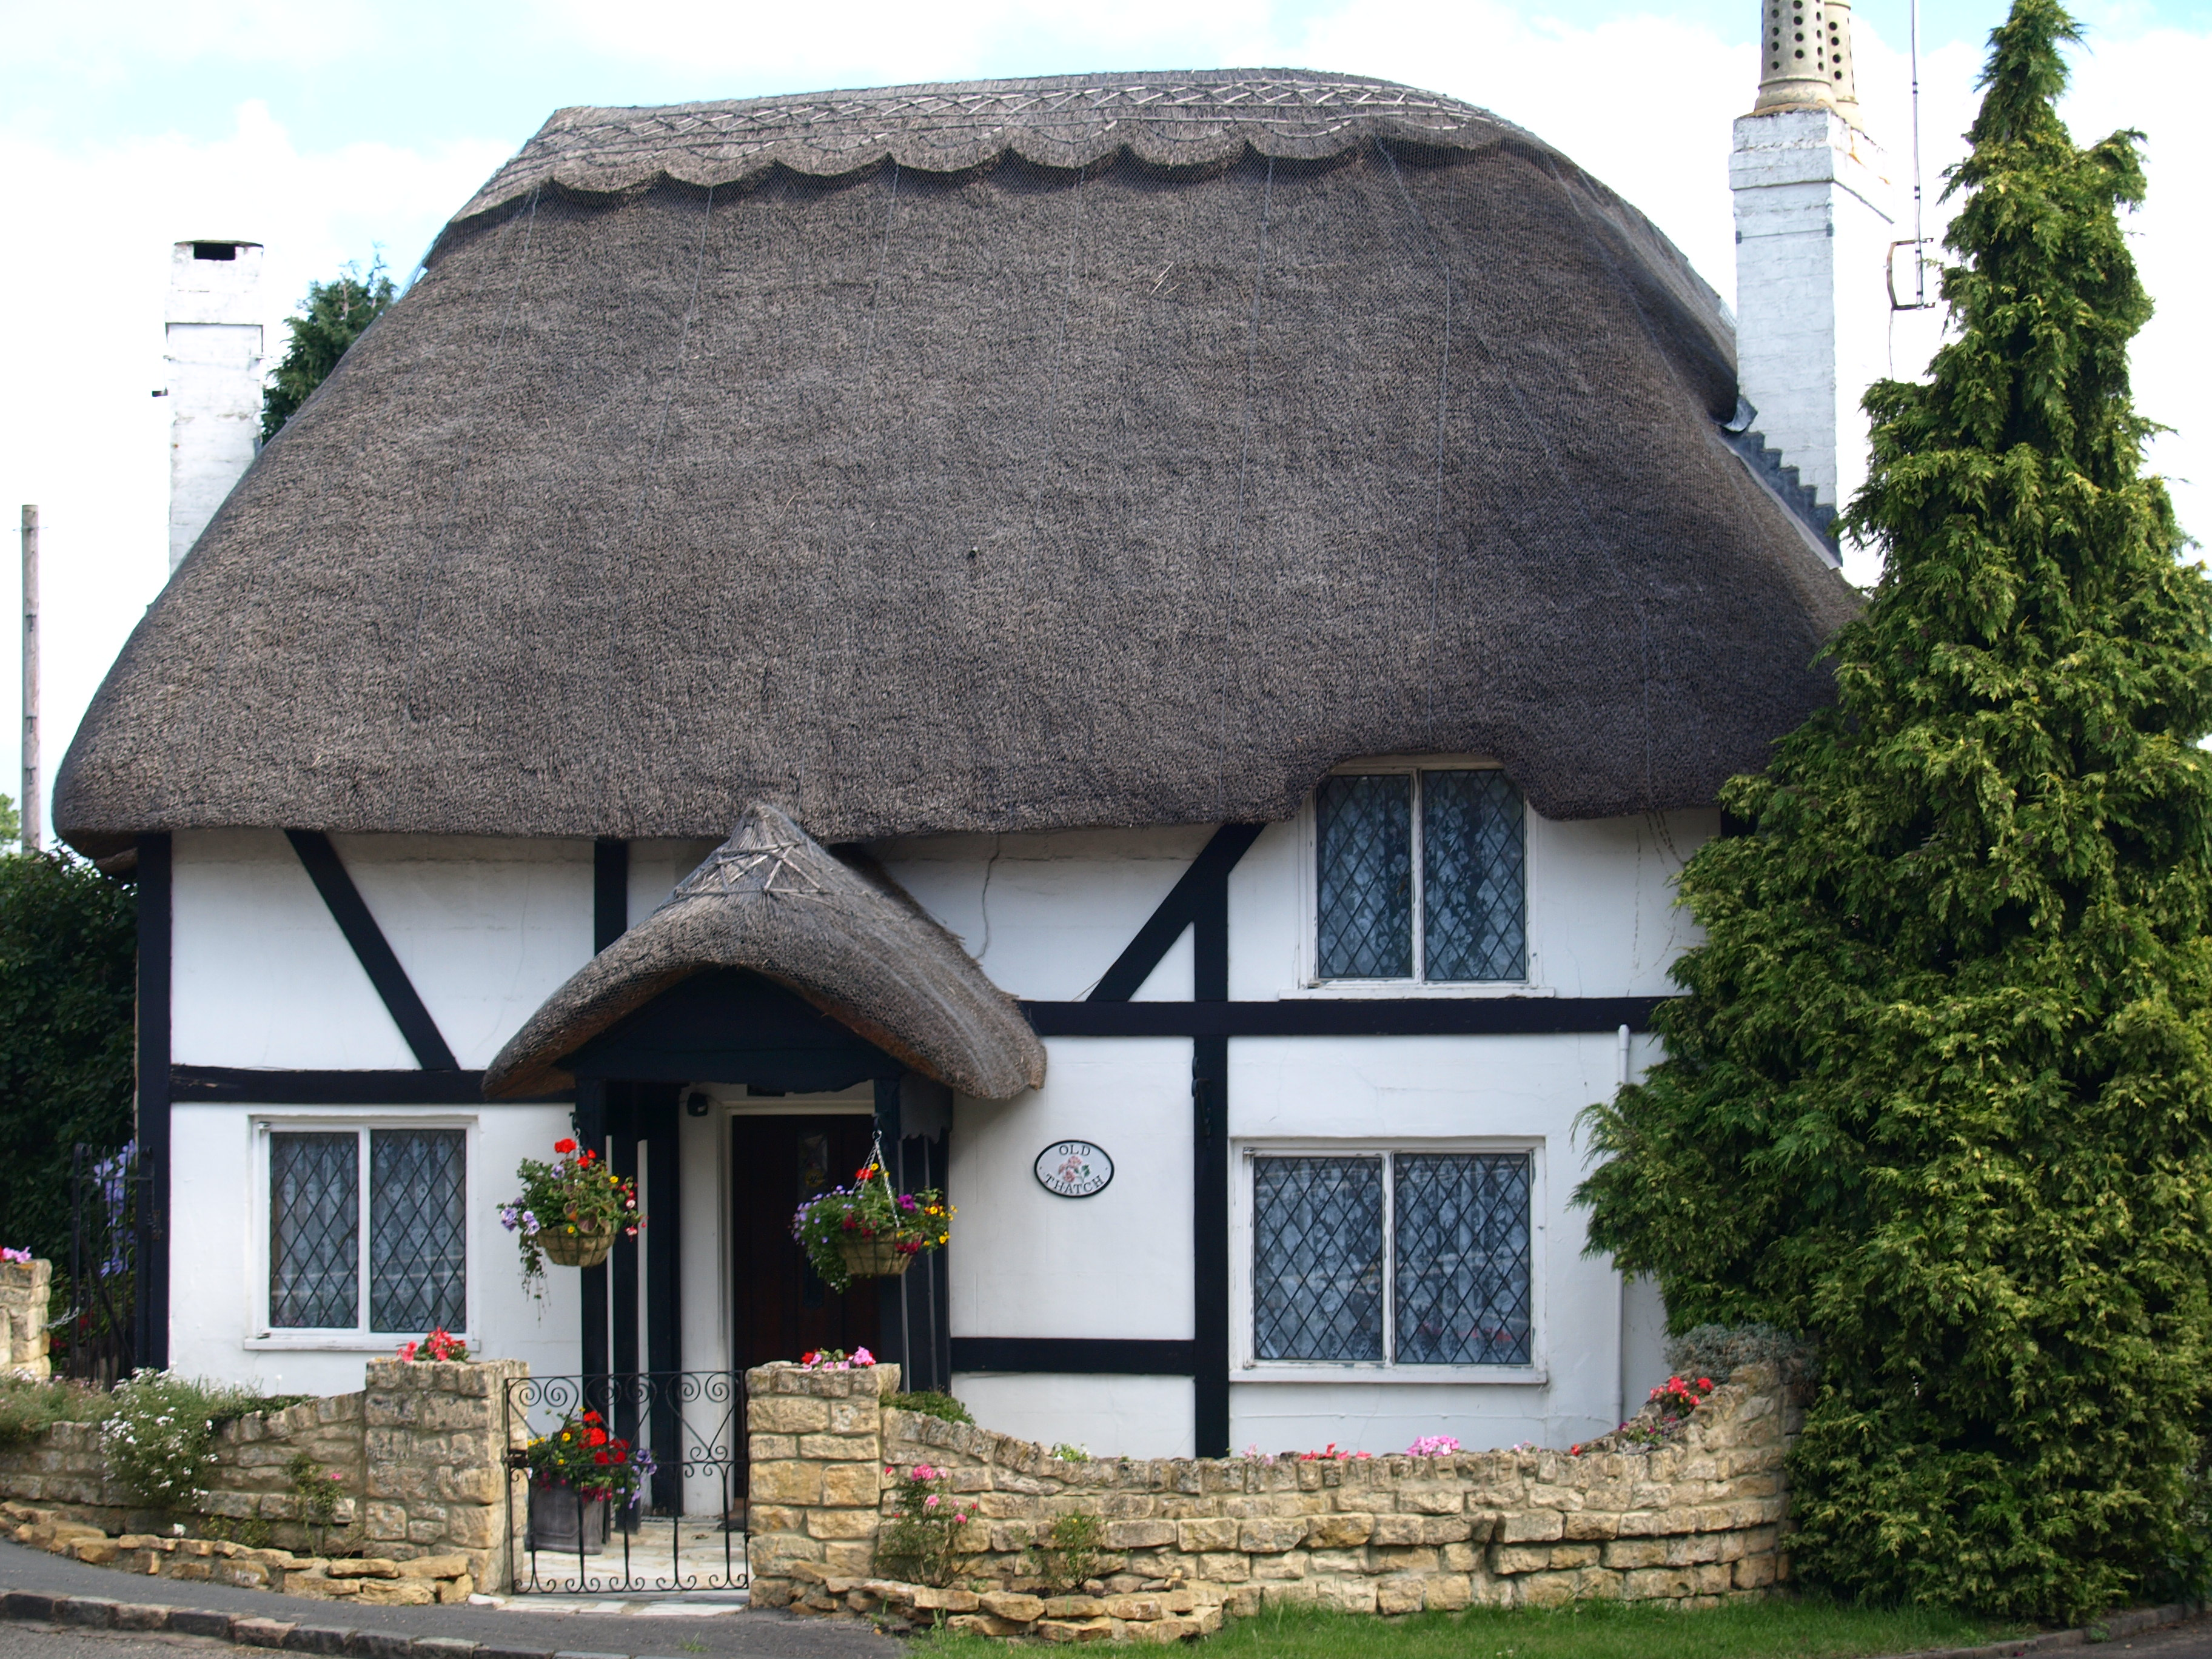 Lisapreston Thatch Roof